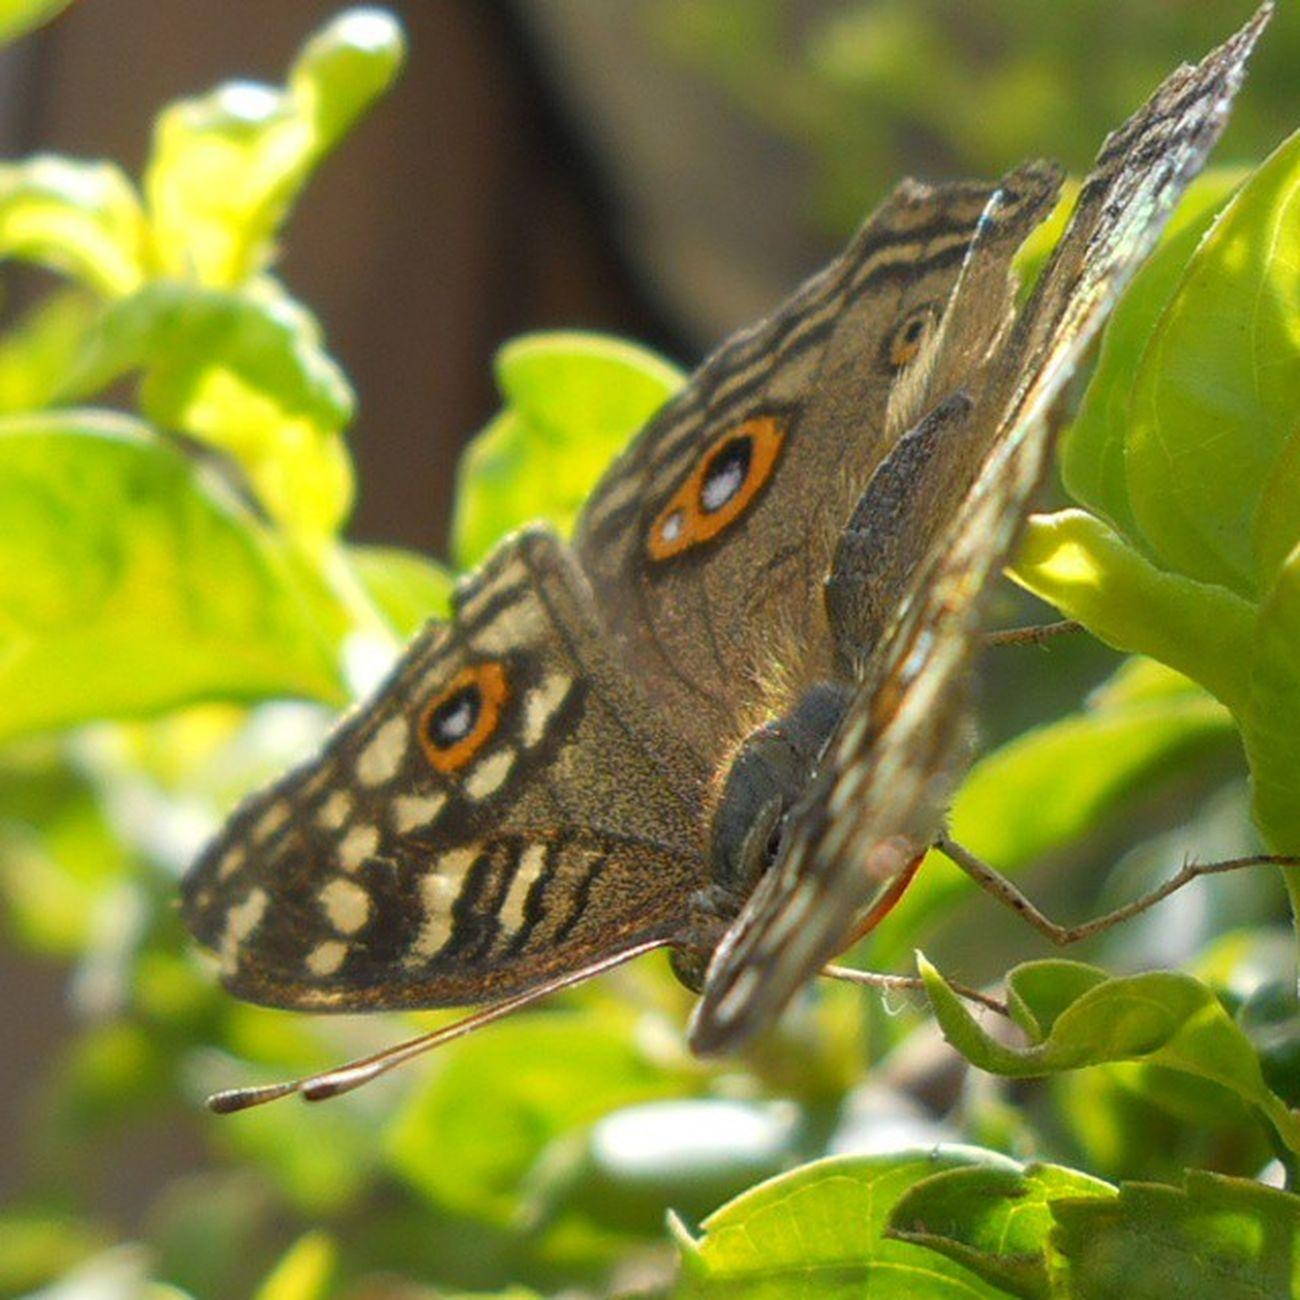 I do not know whether I was then a man dreaming I was a butterfly, or whether I am now a butterfly dreaming I am a man.......... Nofliters Photoartegram Photographyislifee Photooftheday Ptk_macro Ptk_nature Instaamici Ig_captures_macro Igclubbutterfly Insects  Ig_today Ig_india Skymasters_jointhefamily Macro_perfection Macro_ig Macroworld_tr Fotoartegram Global_family Princely_shotz Ig_photooftheday Ig_shots Igs_asia Ig_camera_united Gf_india Igersbestshot igersblog macrophotography macro_kingdom macro_premier tagsforlikes